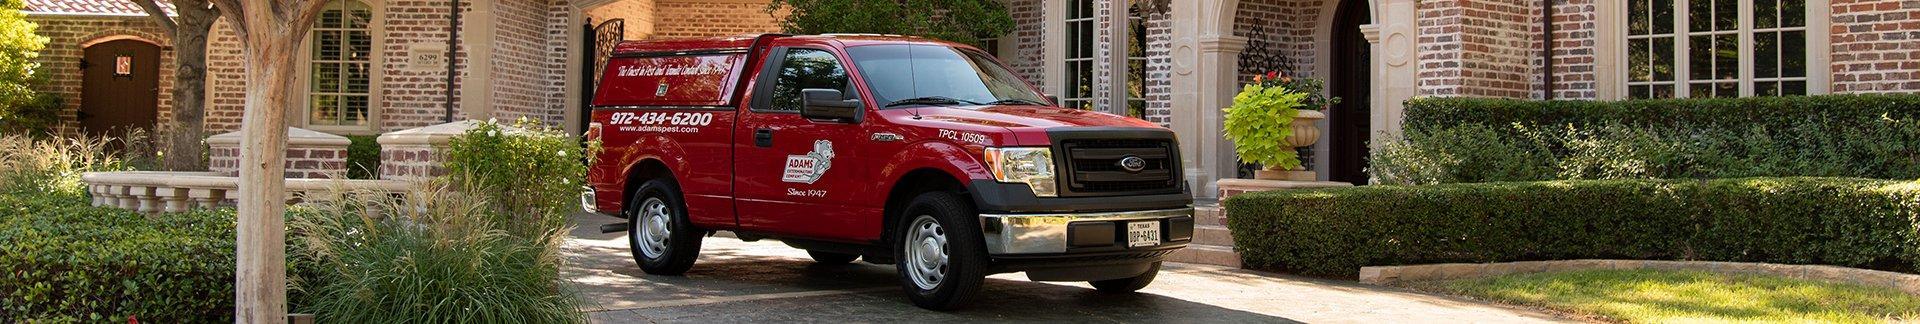 adams pest control's truck in fairview tx